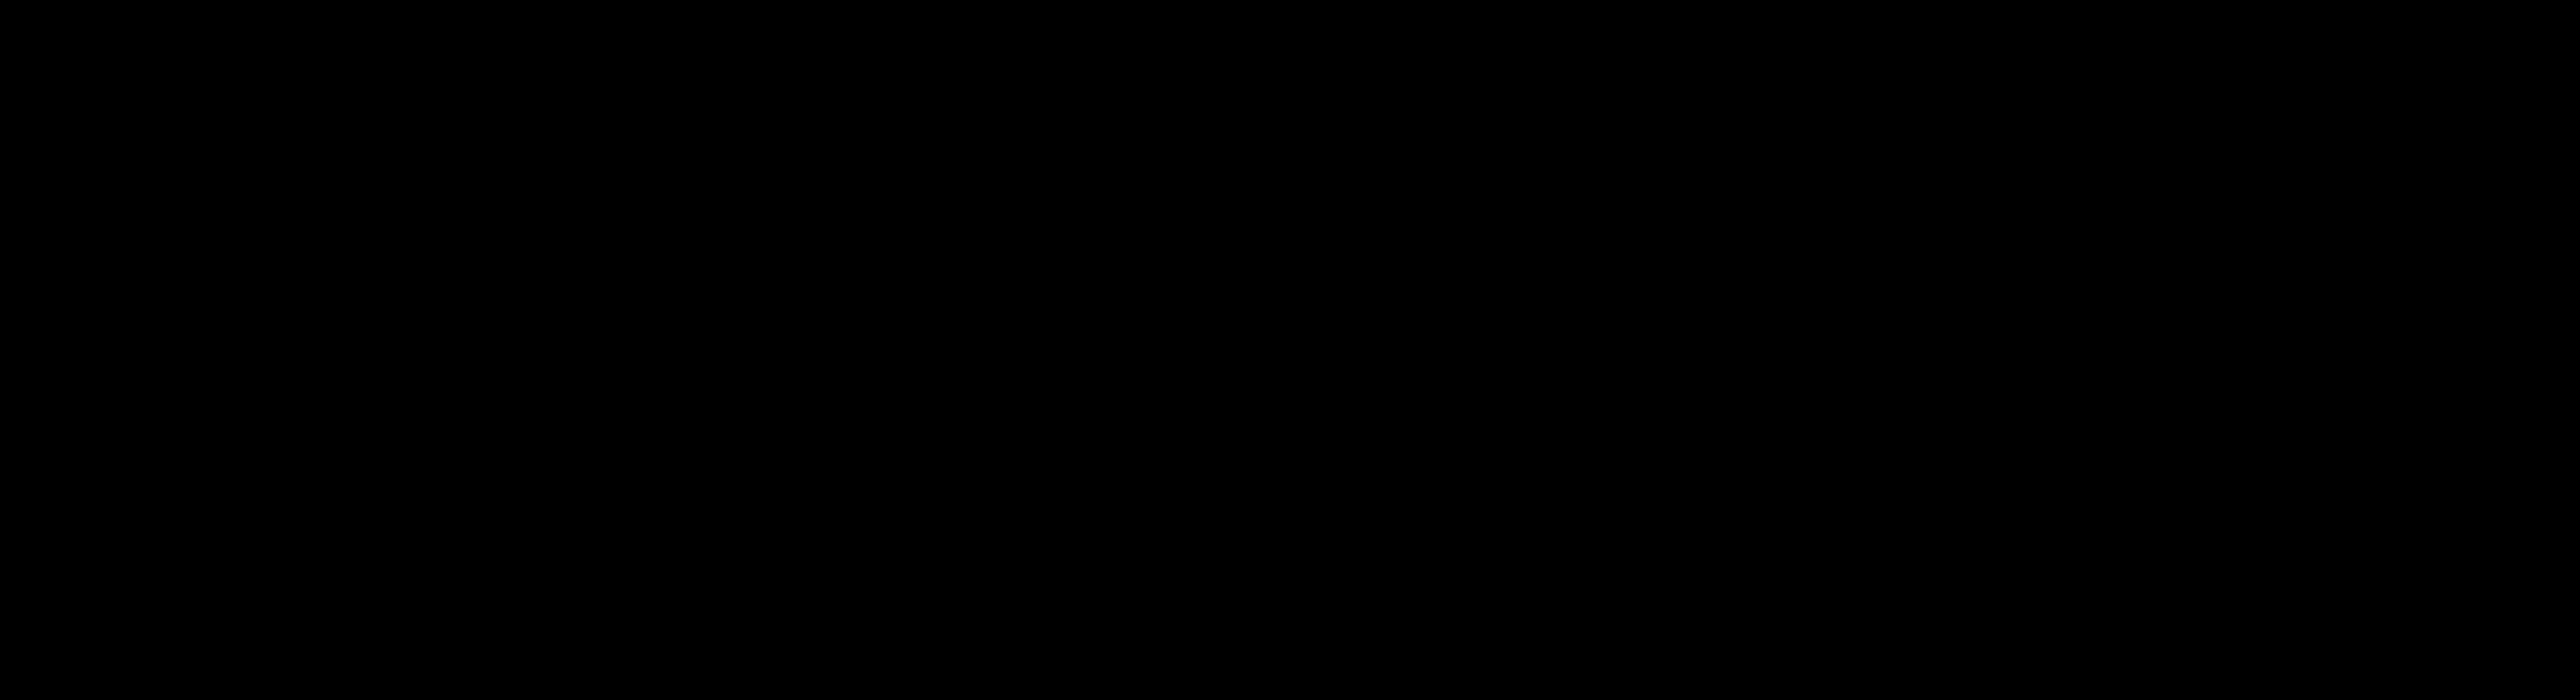 Lobeglitazone-d<sub>3</sub>